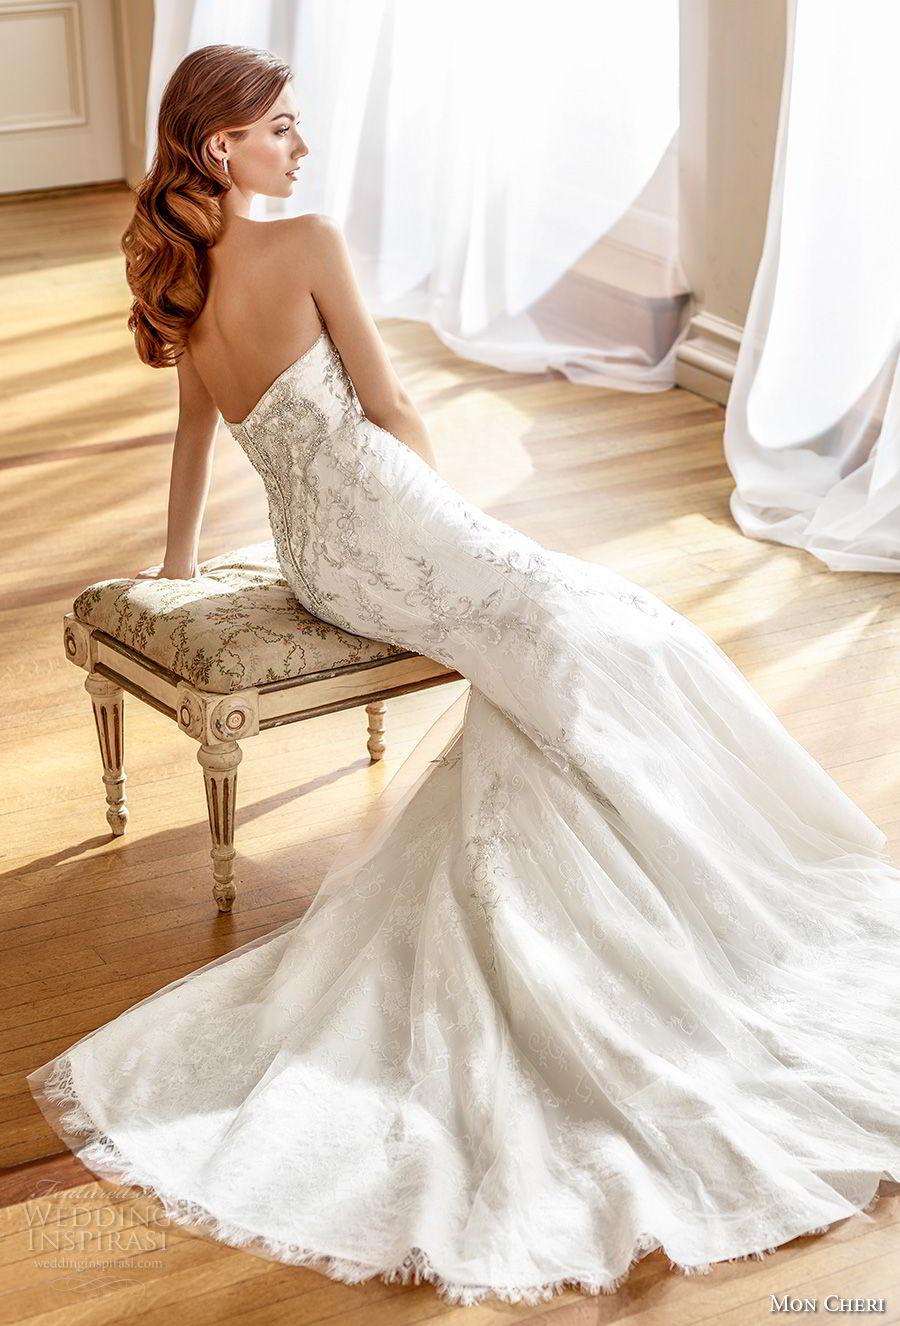 mon cheri fall 2017 bridal strapless sweetheart neckline heavily beaded embellished bodice glamorous elegant trumpet mermaid wedding dress medium train (211) bv